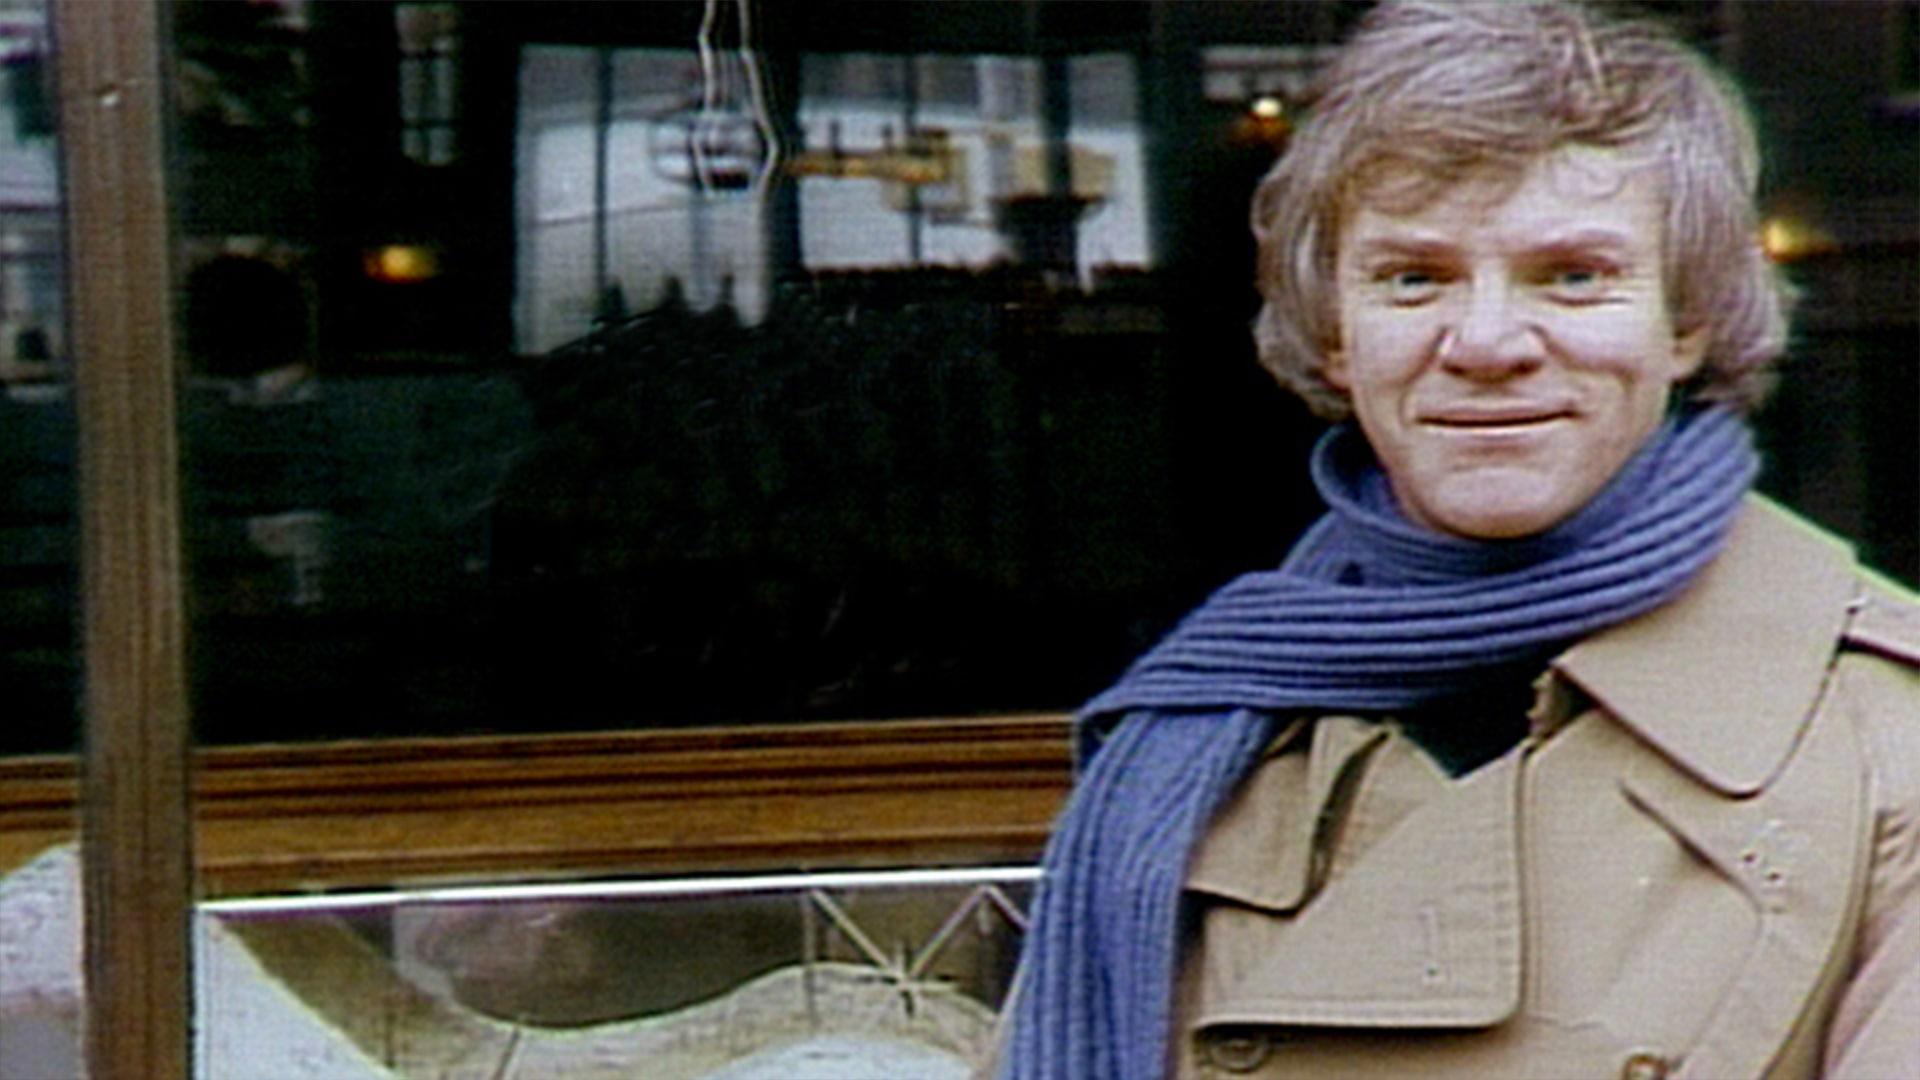 Malcolm McDowell: November 22, 1980